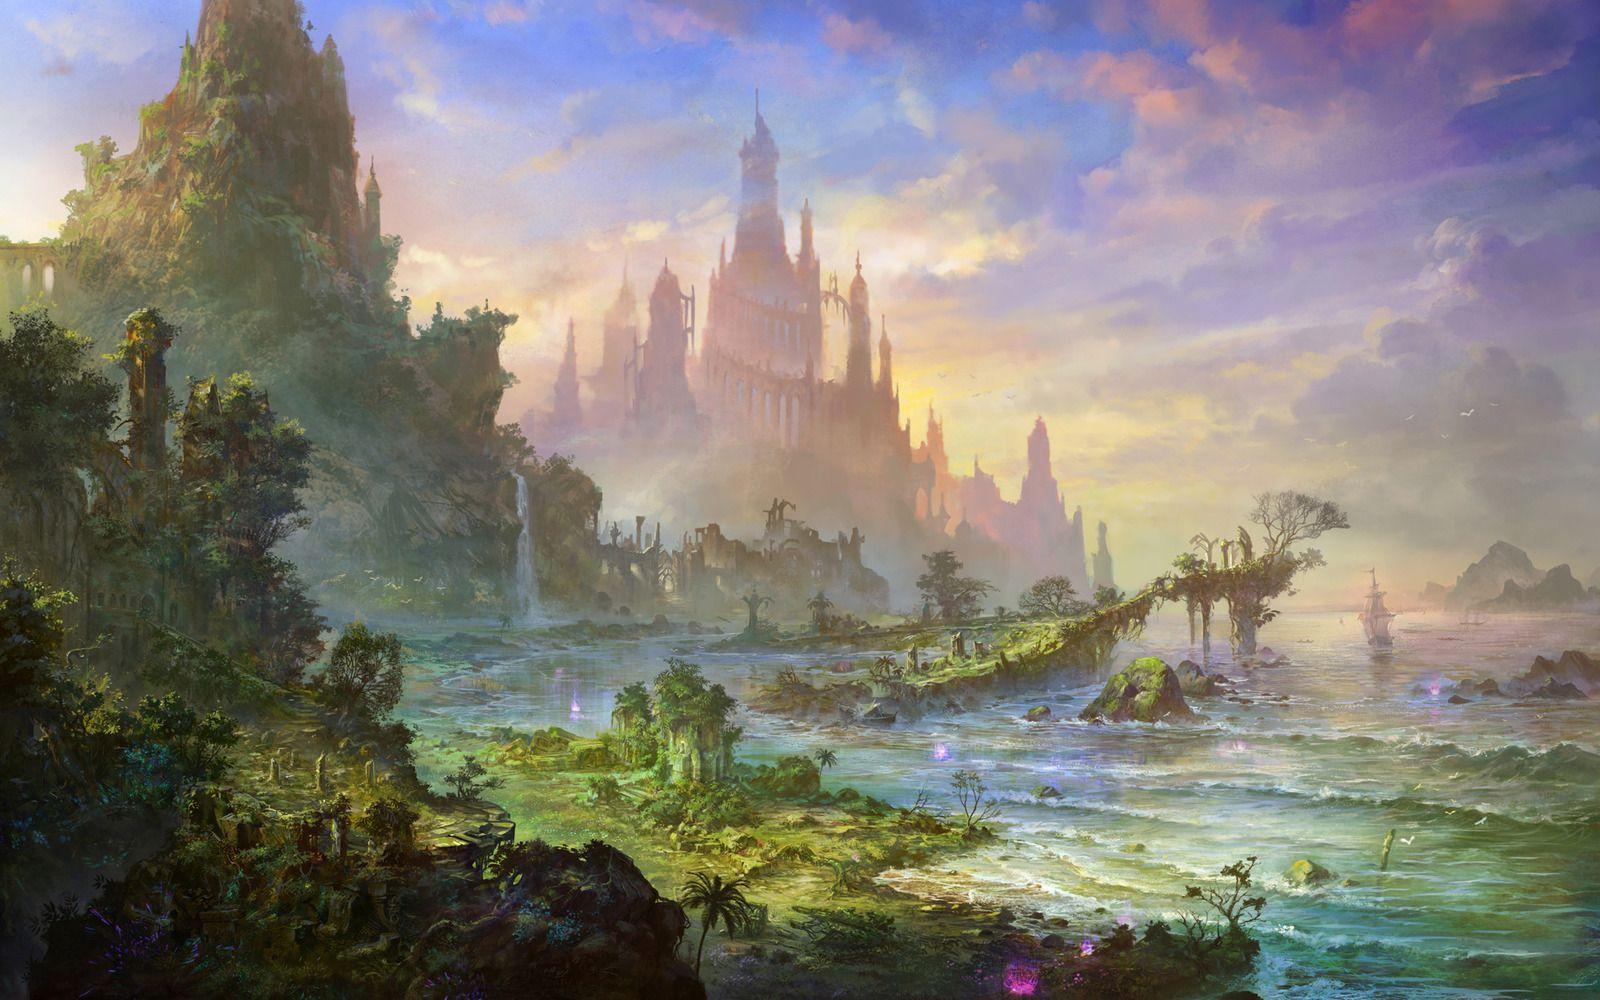 landscapes castles fantasy art - photo #6